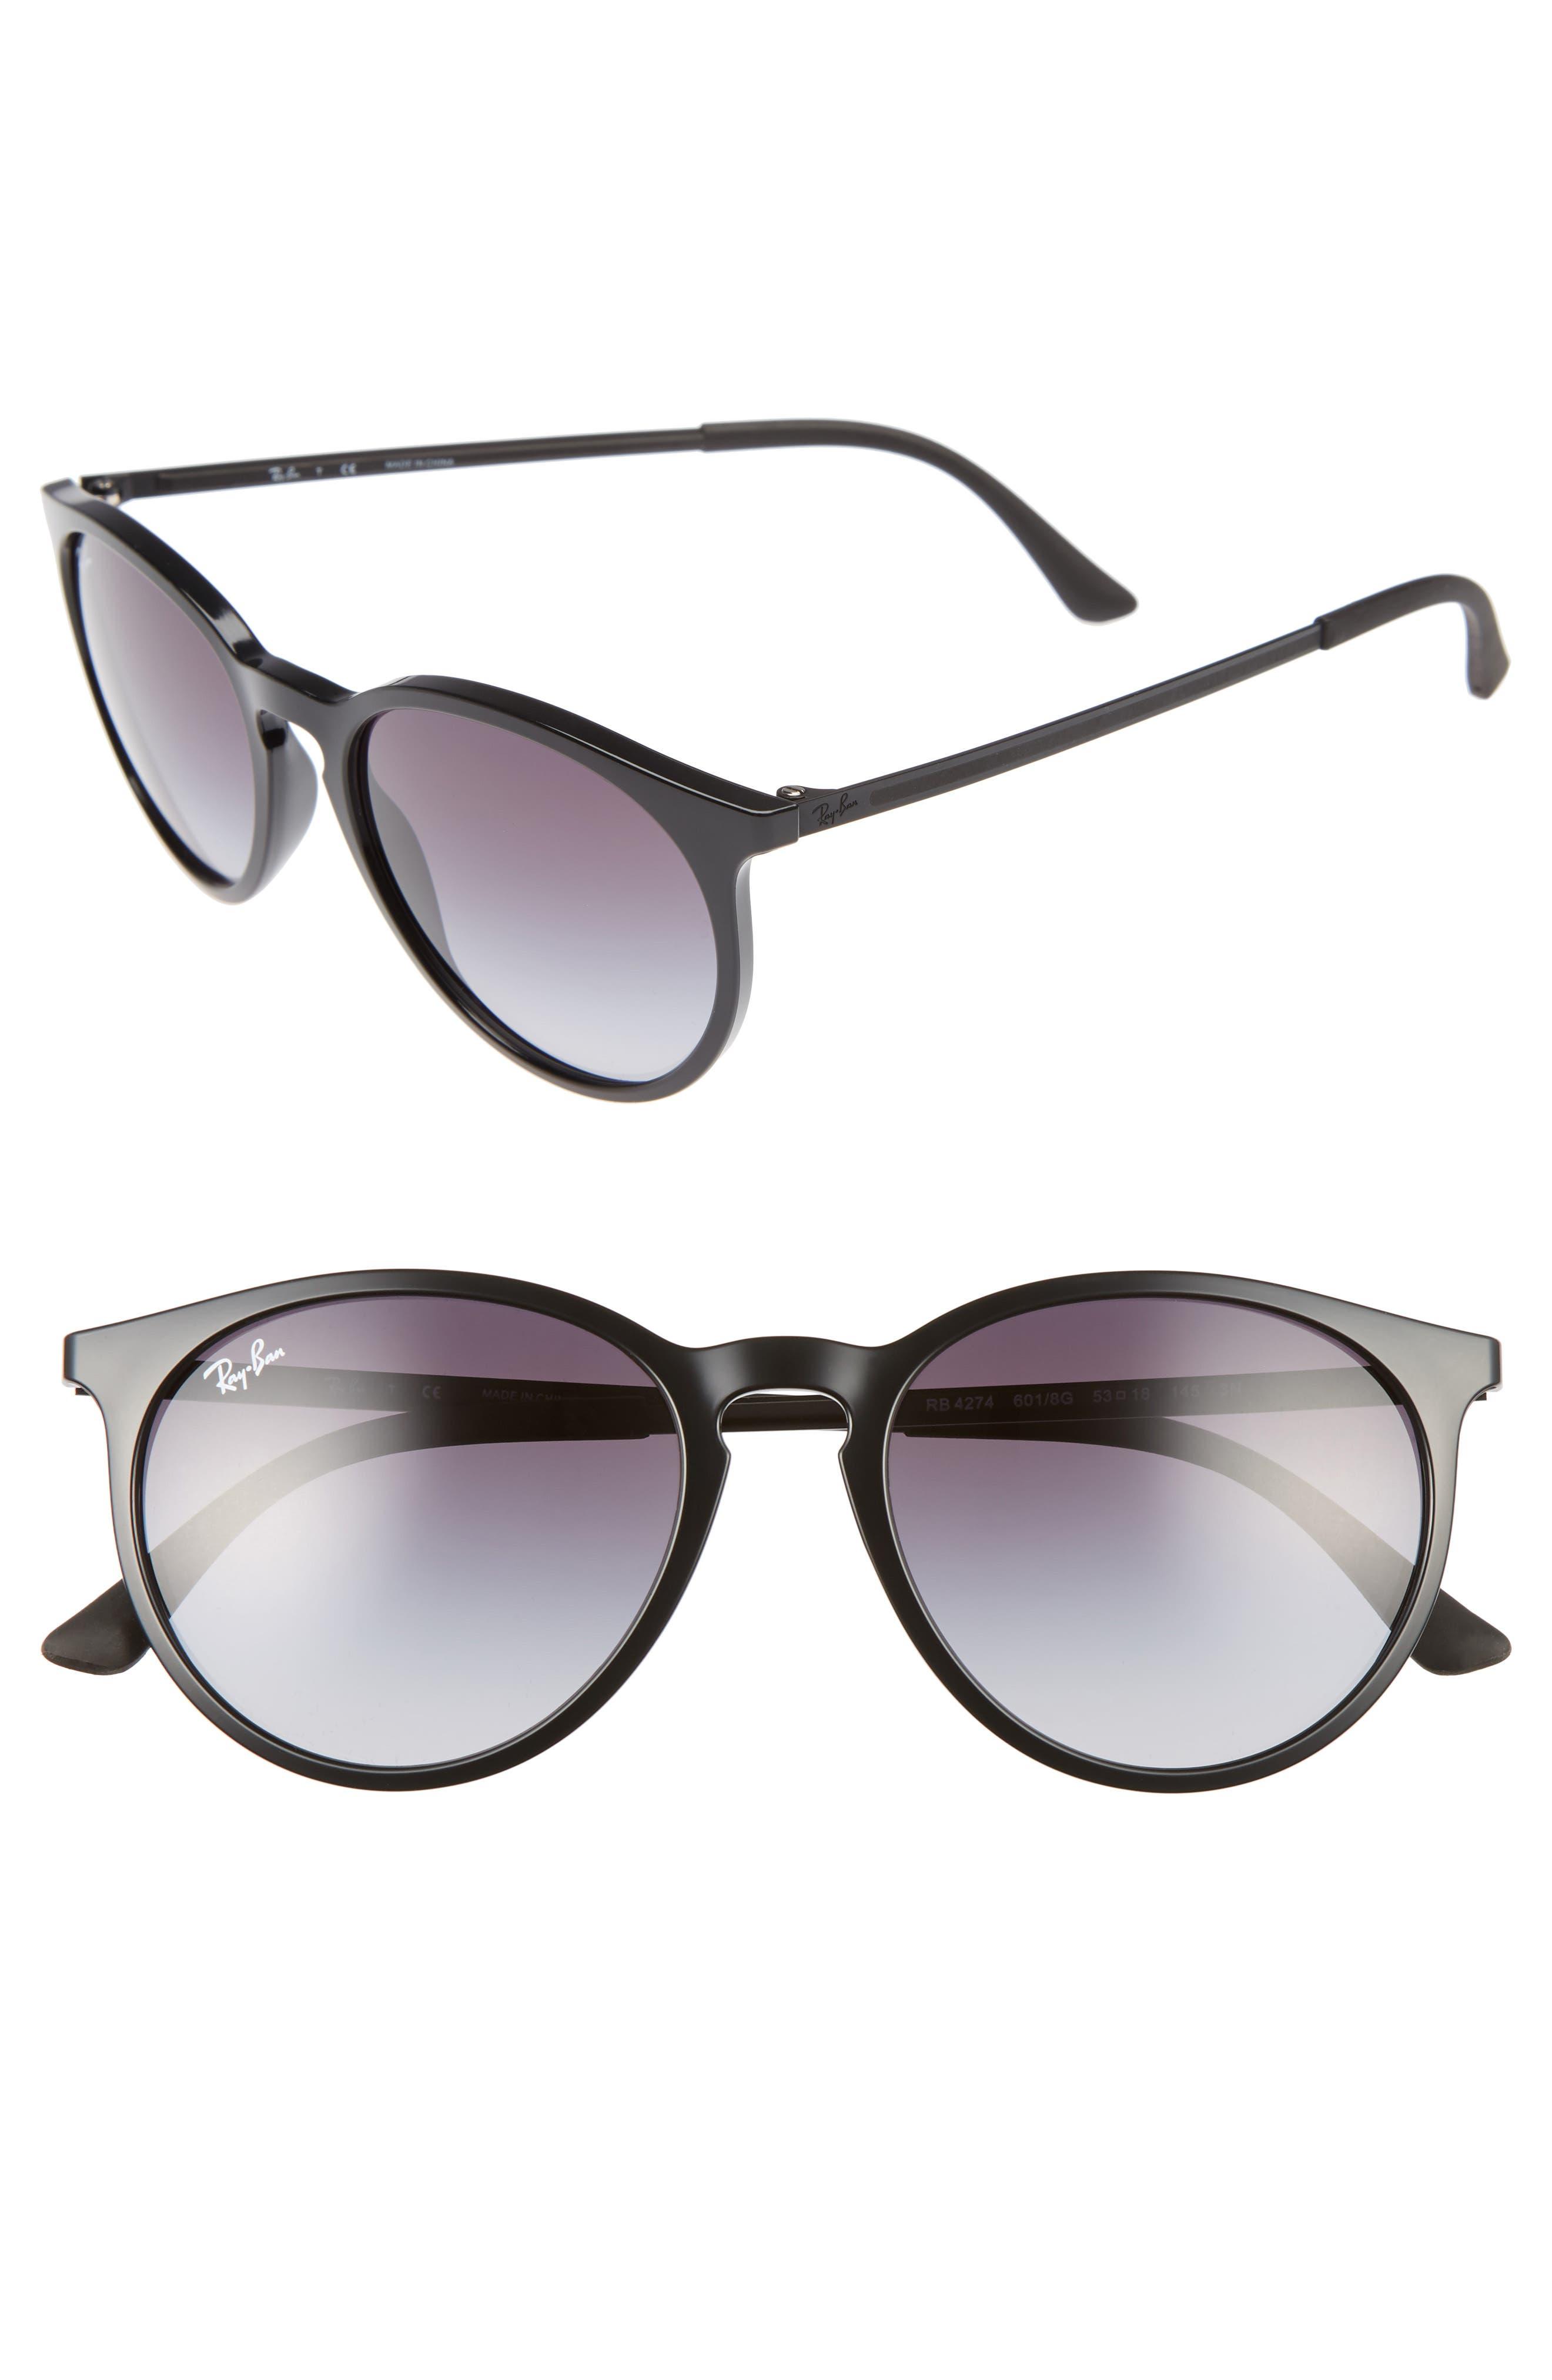 Main Image - Ray-Ban 53mm Gradient Lens Retro Sunglasses